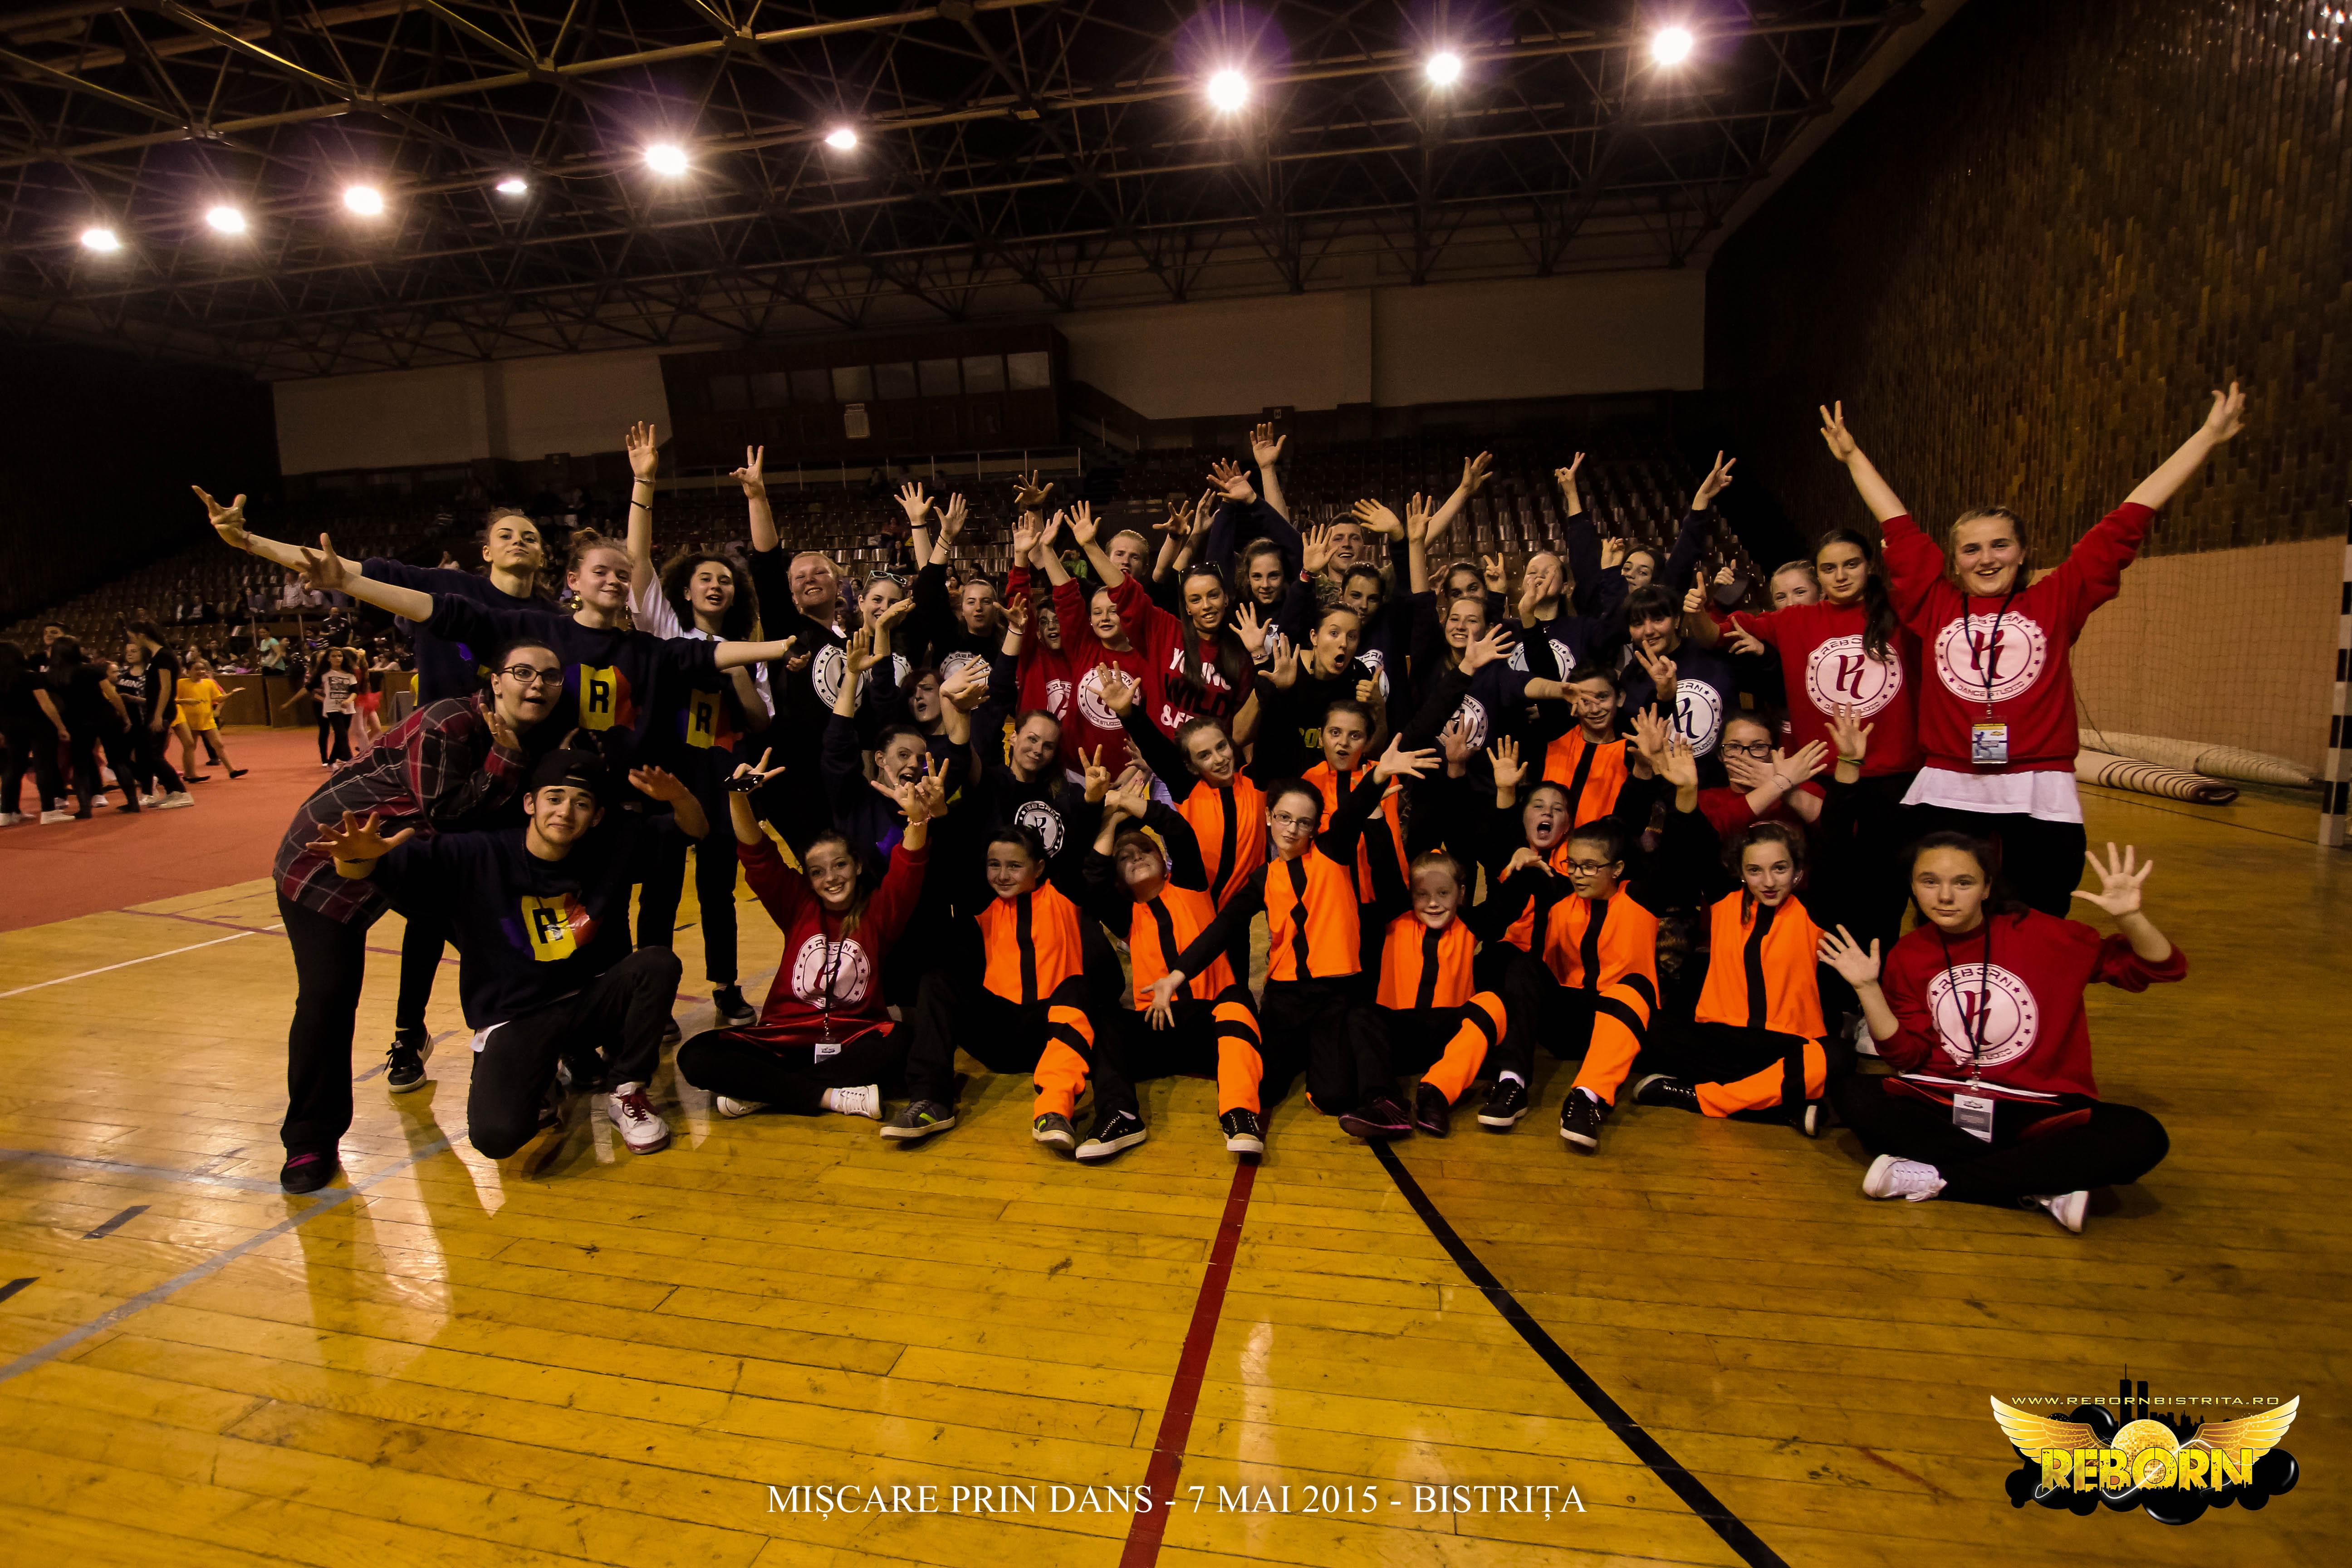 Concursul Mișcare prin Dans, Bistrița 2015